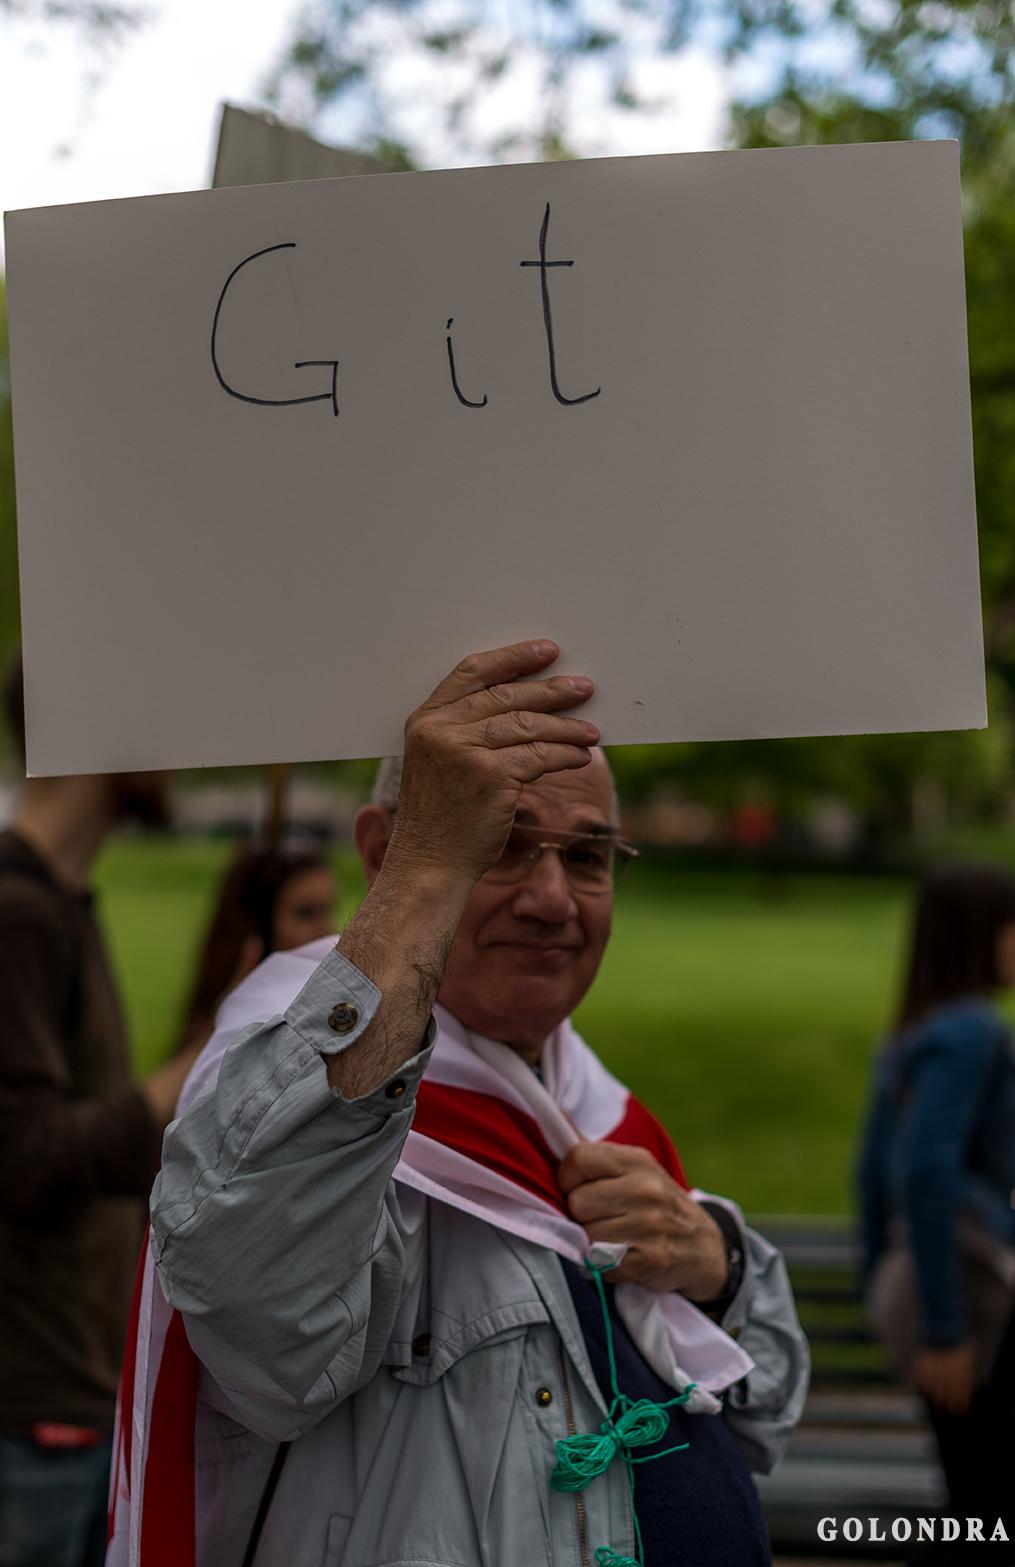 Protesting Turkish Government - Turk Hukumetini Protesto - Londra - London (30)